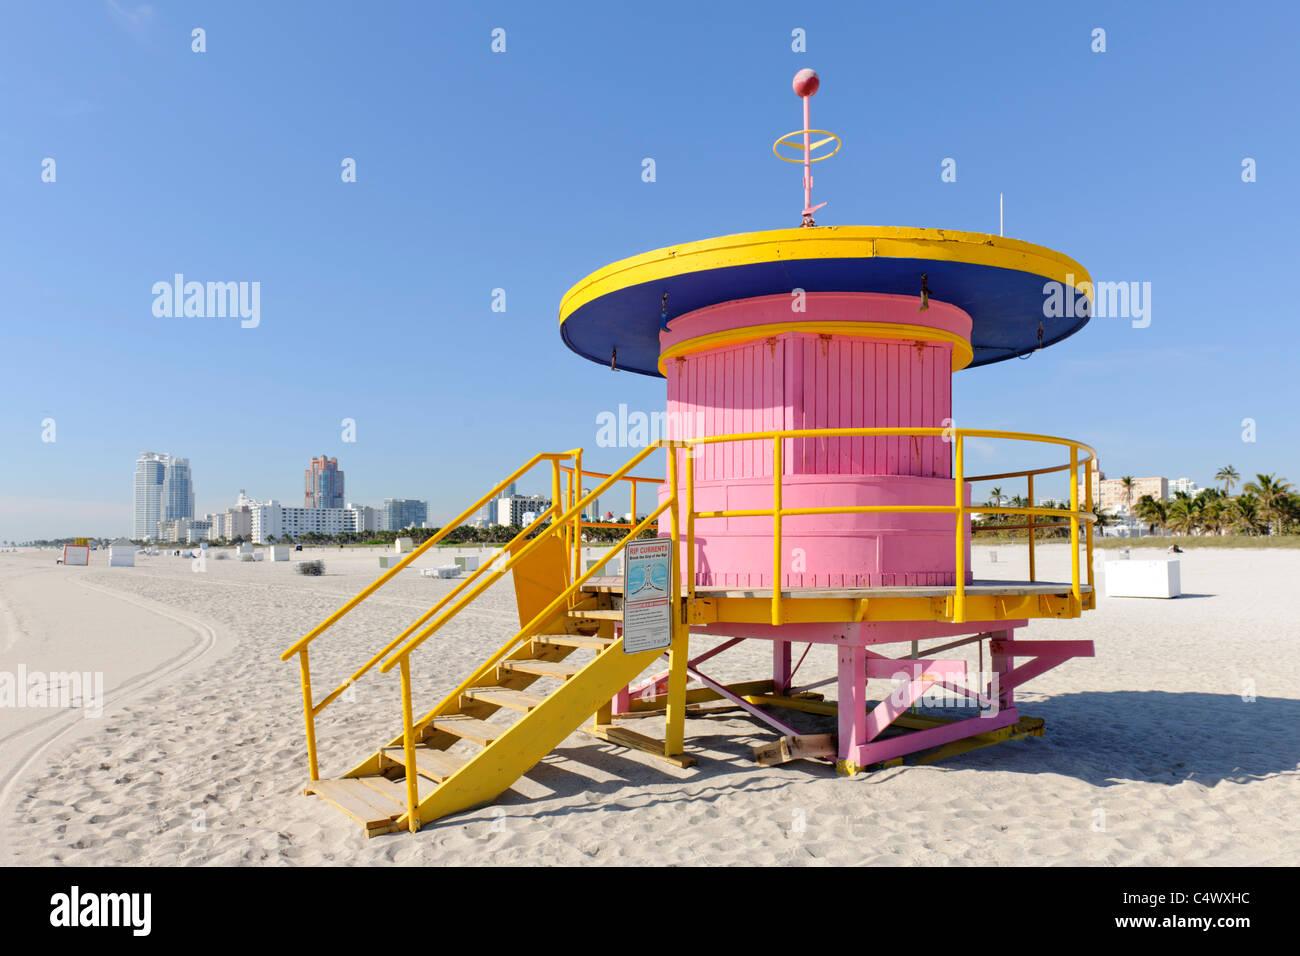 lifeguard hut, South Beach, Miami - Stock Image